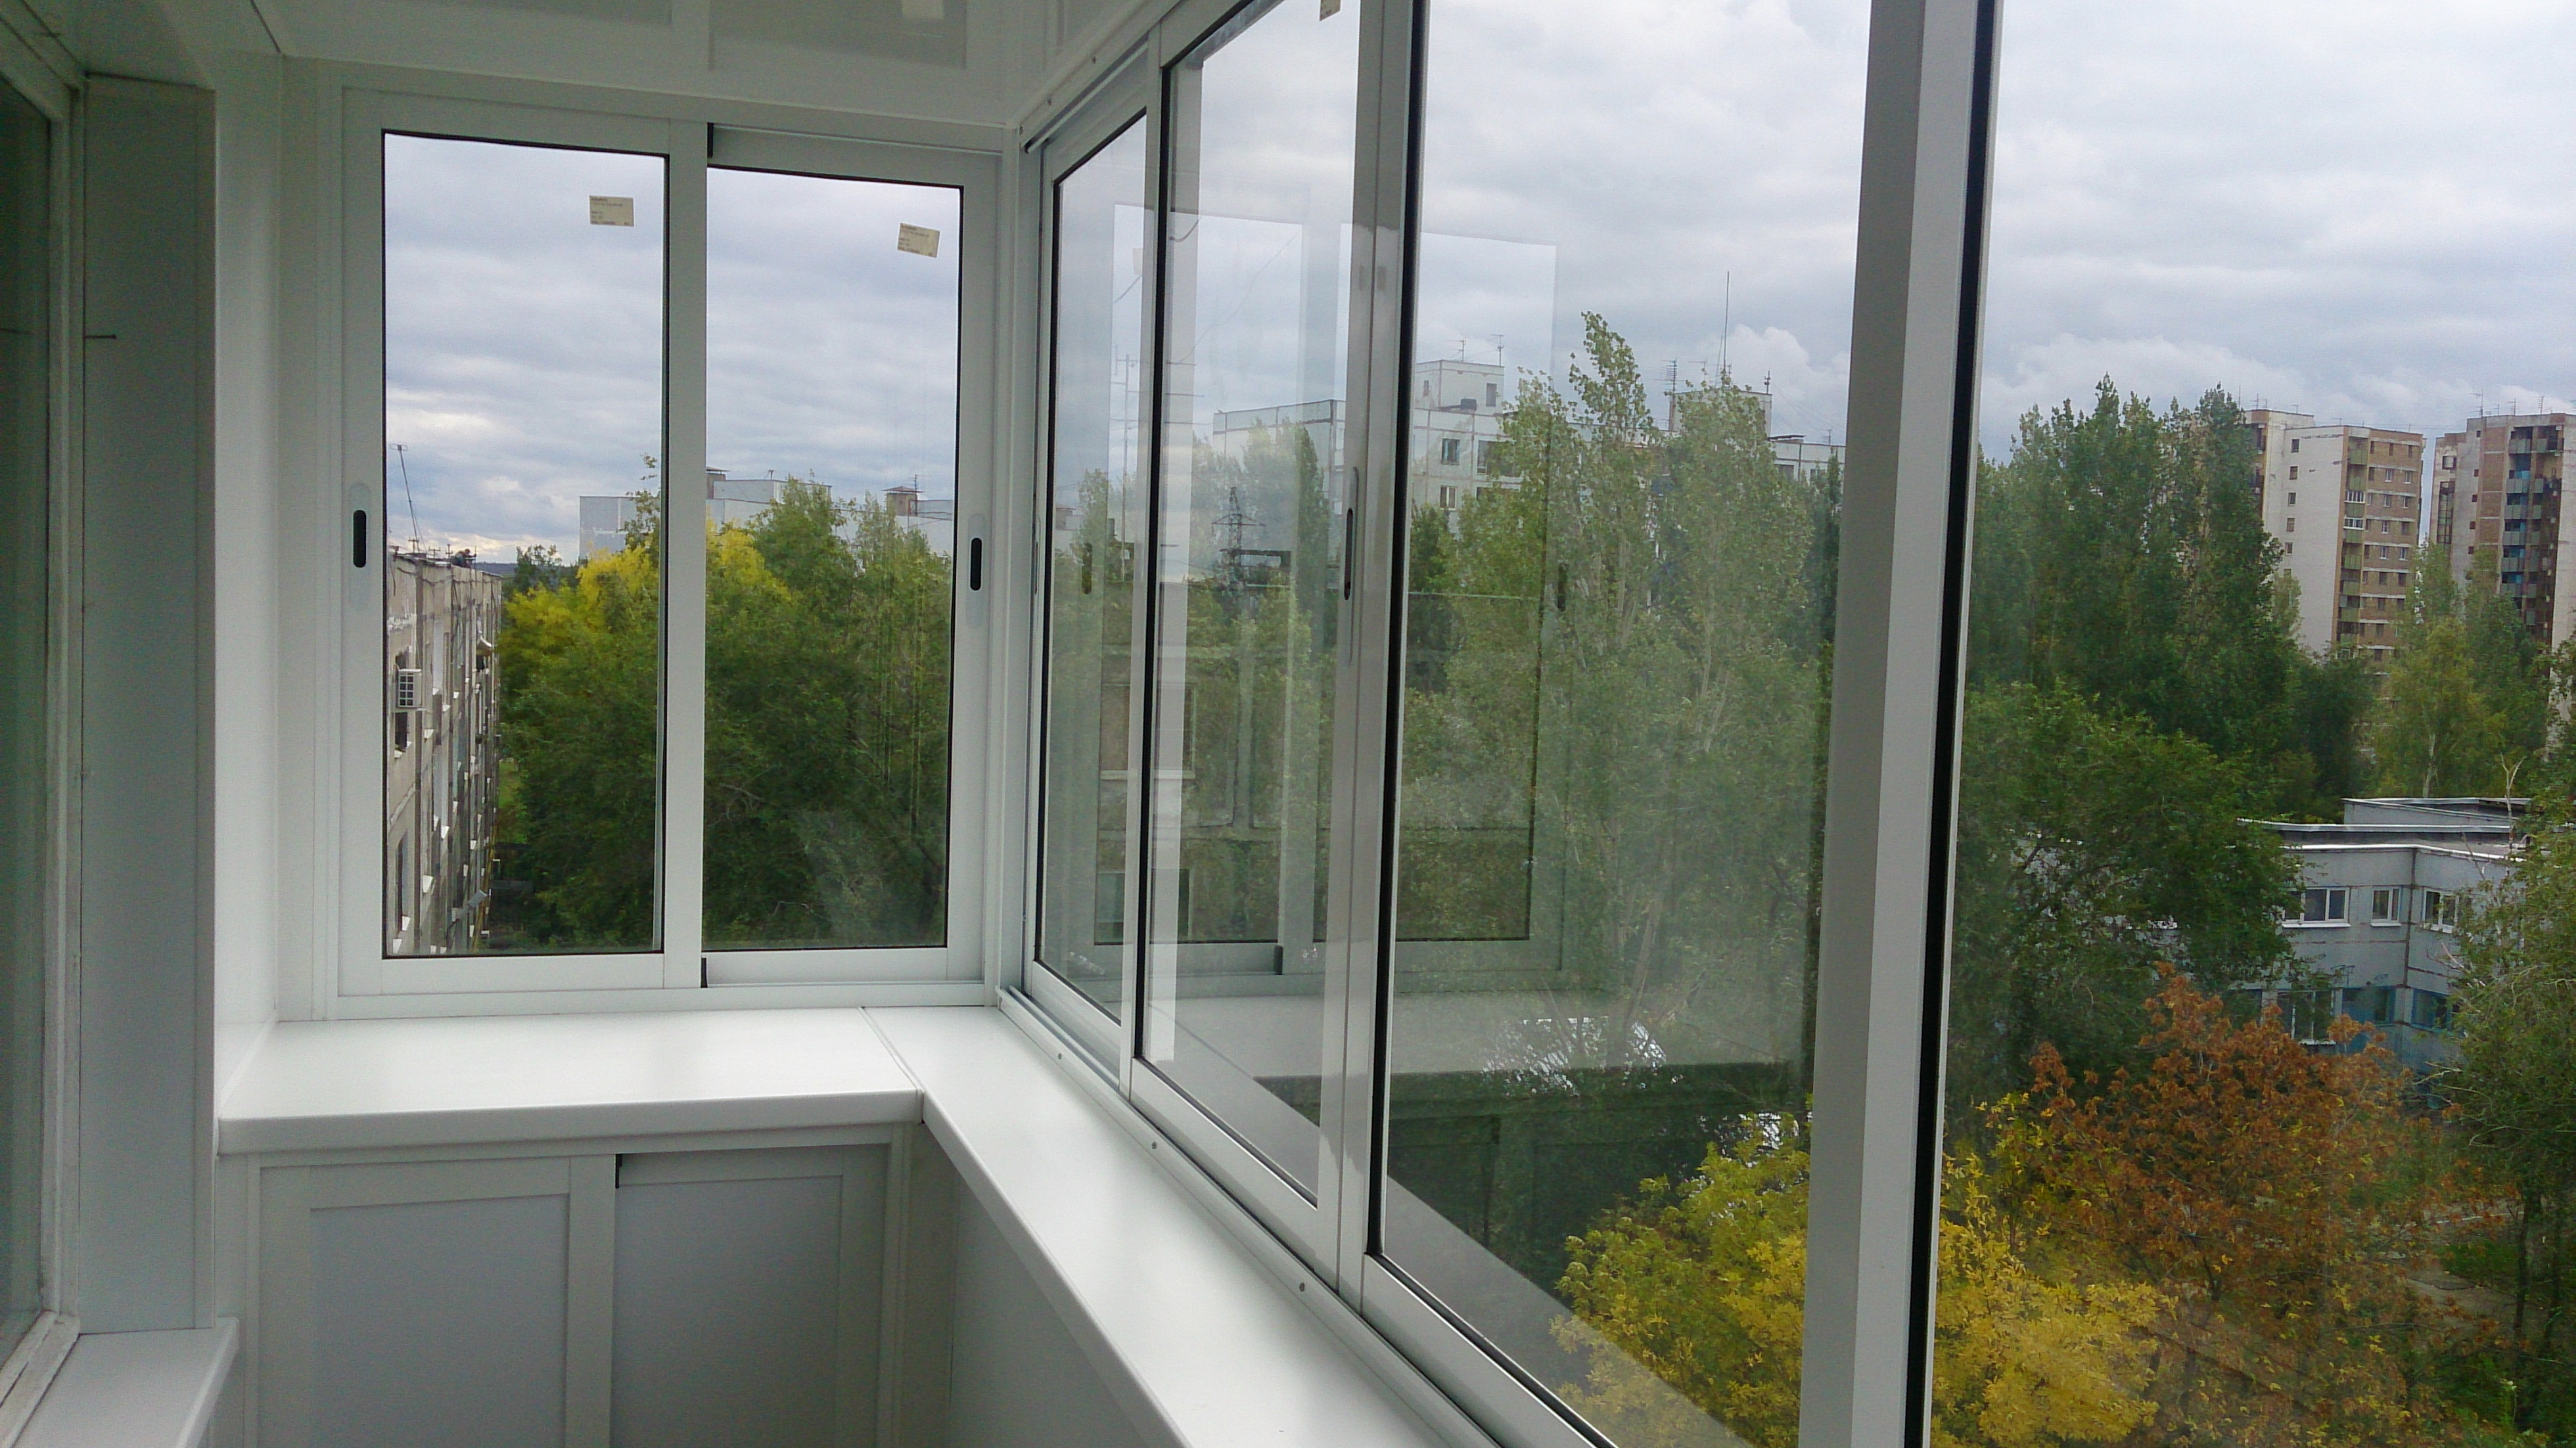 Балкон с алюминиевыми окнами фото.